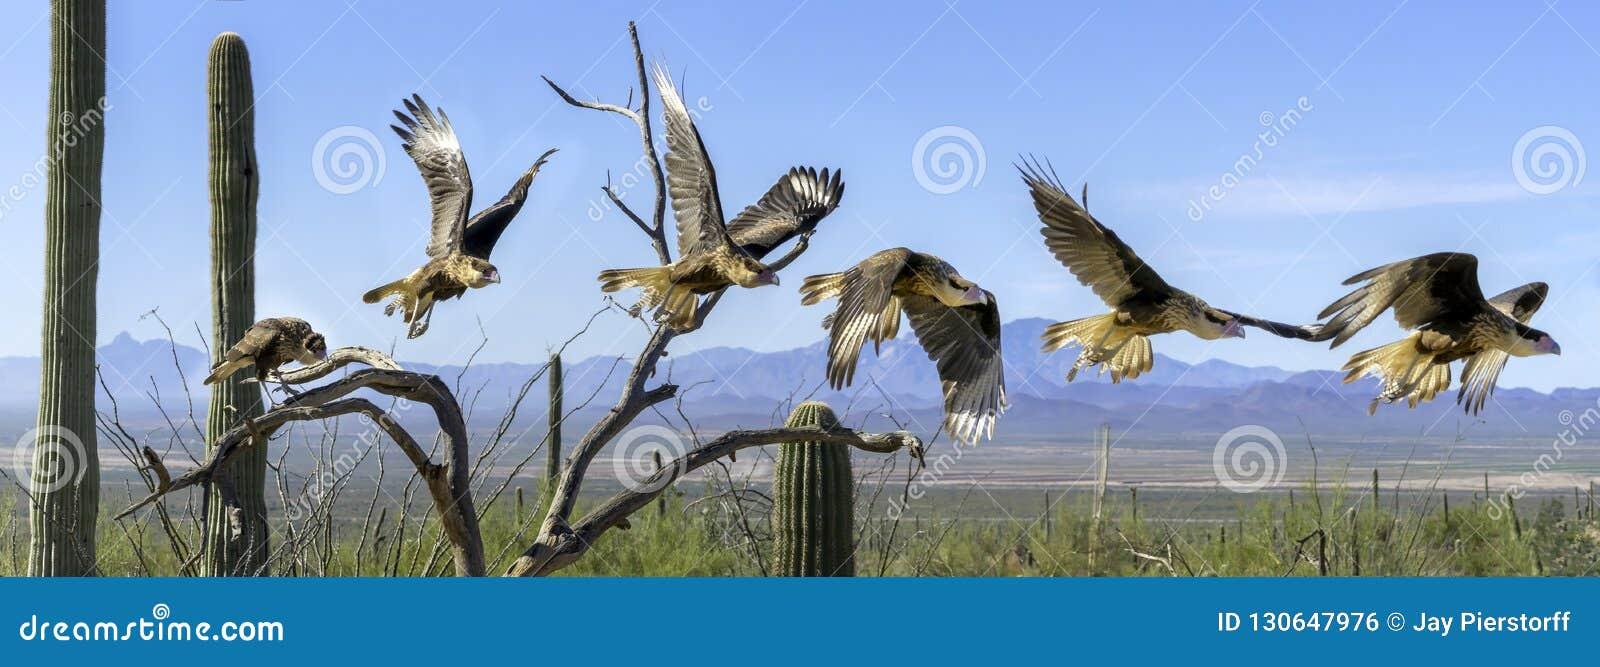 Sequenza cheriway Flyiing di panorama del Caracara crestato del Caracara nel deserto di Sonoran